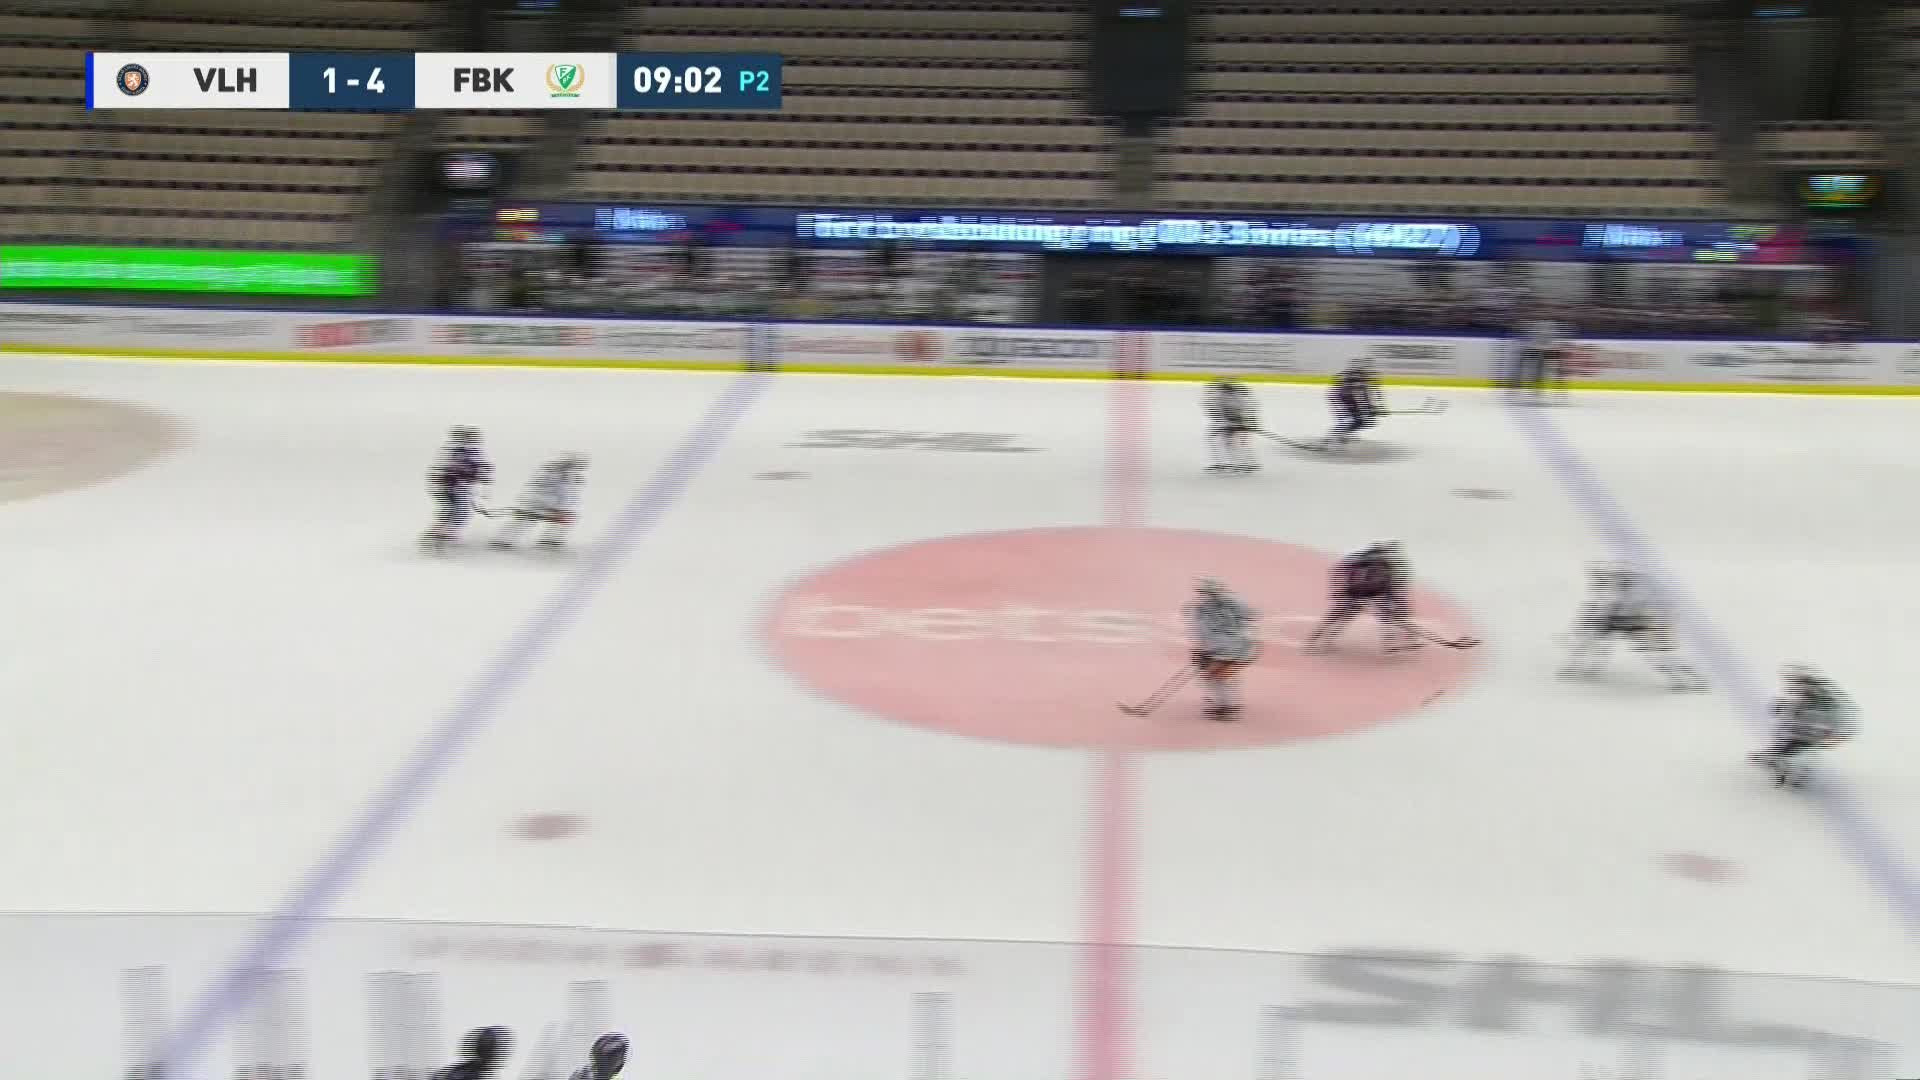 Växjö Lakers - Färjestad BK 2-4